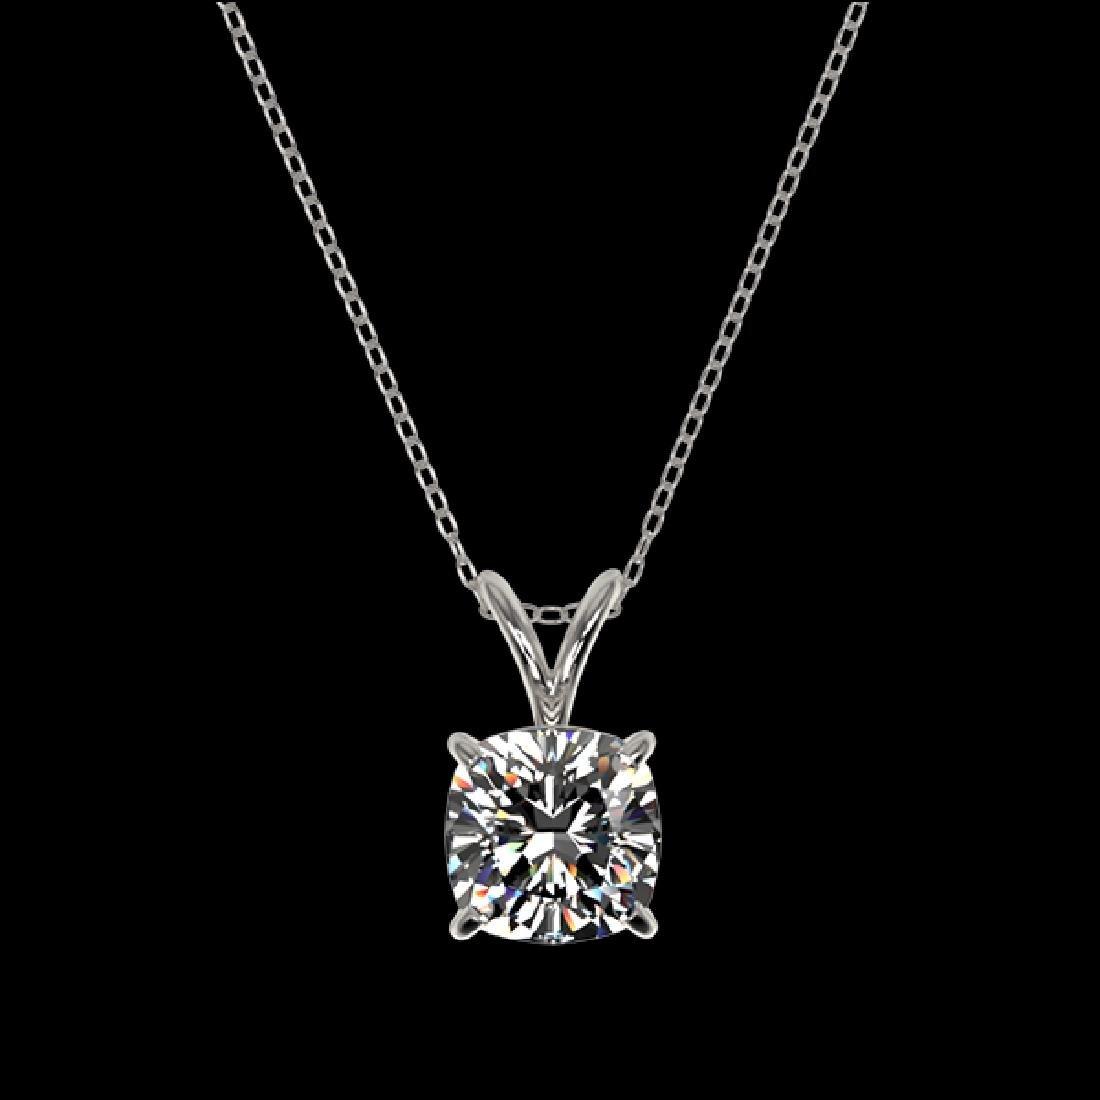 1 CTW Certified VS/SI Quality Cushion Cut Diamond - 3